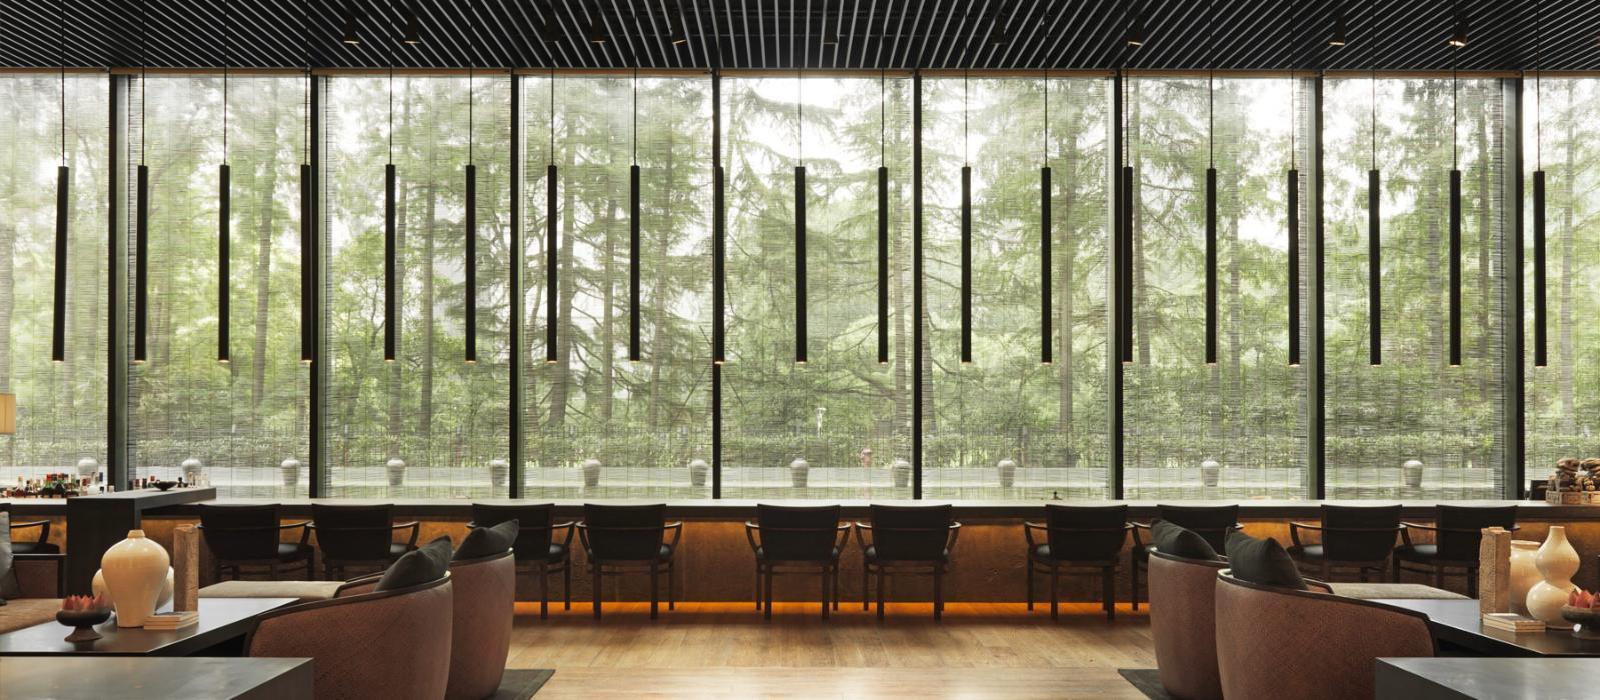 璞麗酒店(The PuLi Hotel and Spa)【 上海,中國】 酒店  www.533304.buzz